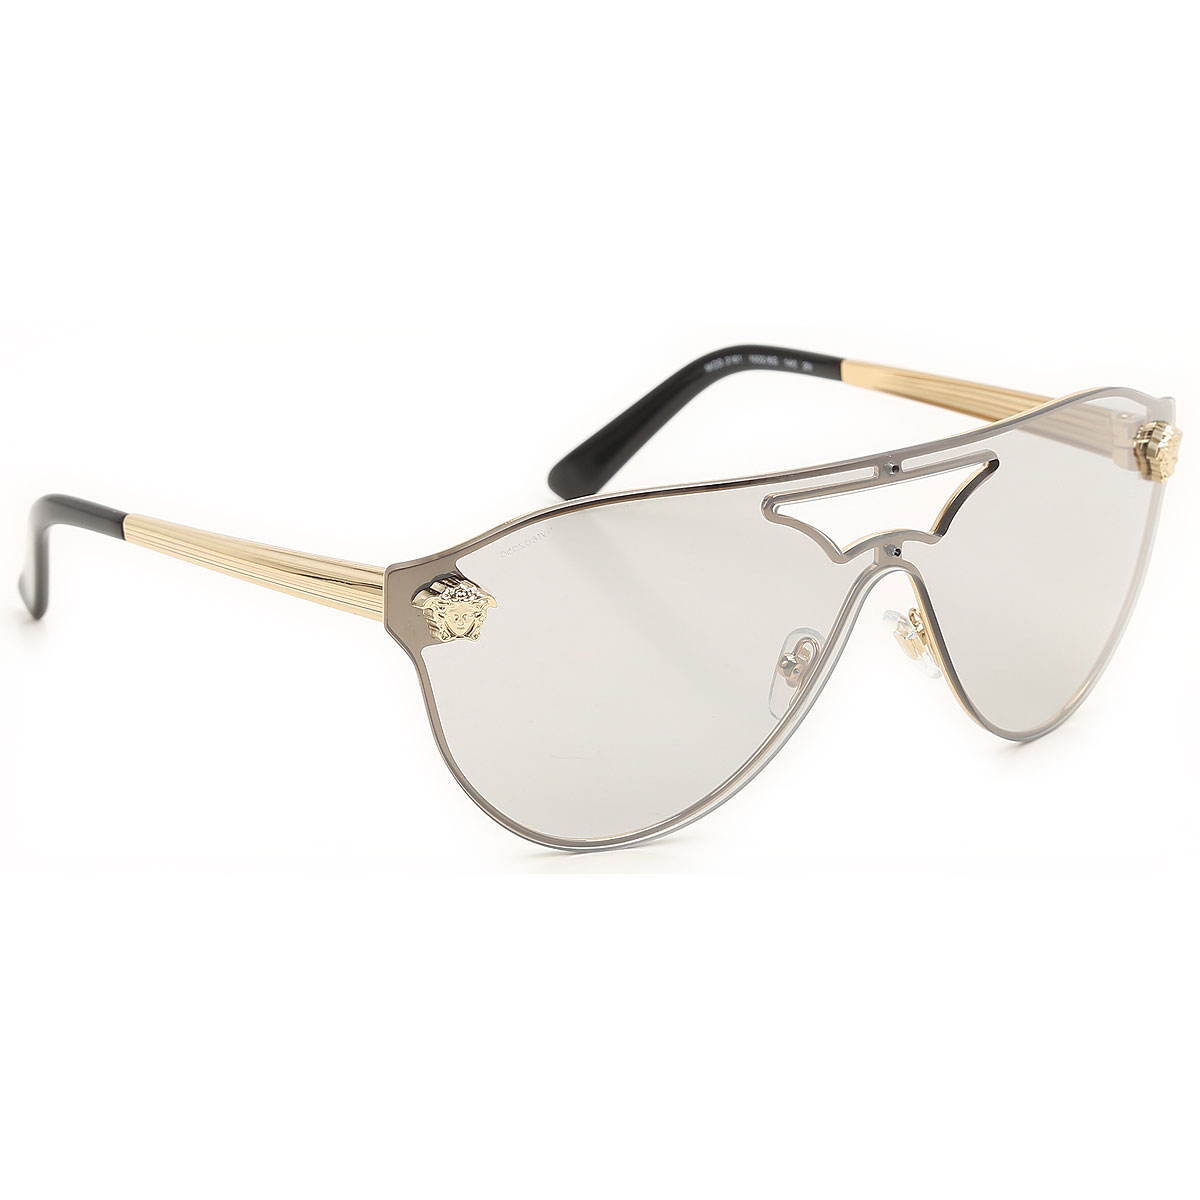 Gianni Versace Sunglasses On Sale, Gold, 2019